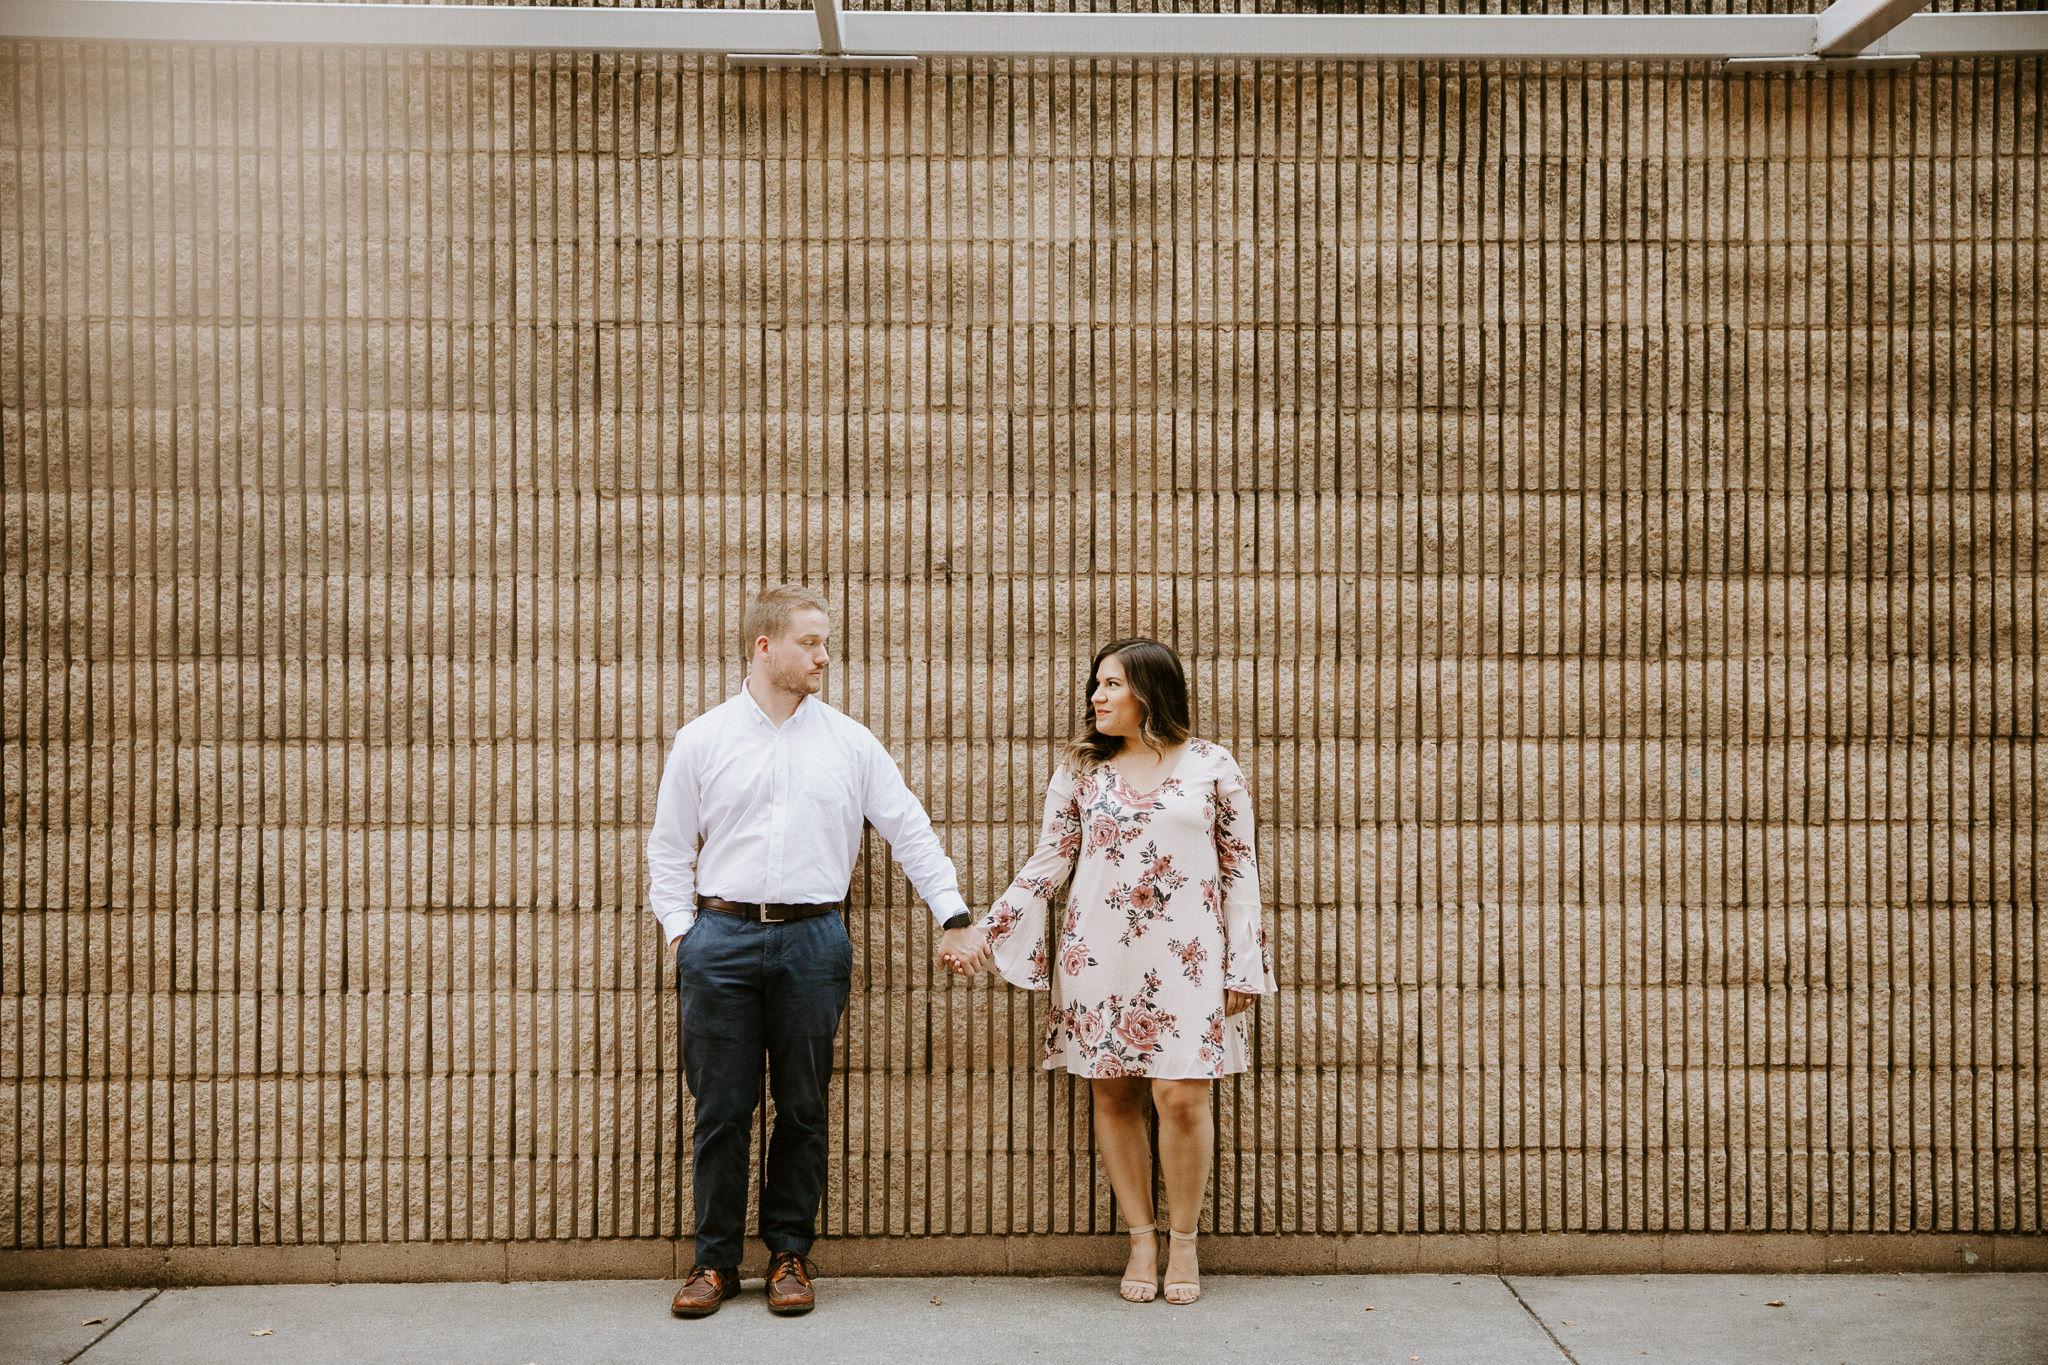 Engagement - Downtown Roanoke -  Wedding Photographer - Virginia - Best - Pat Cori Photography-4.jpg